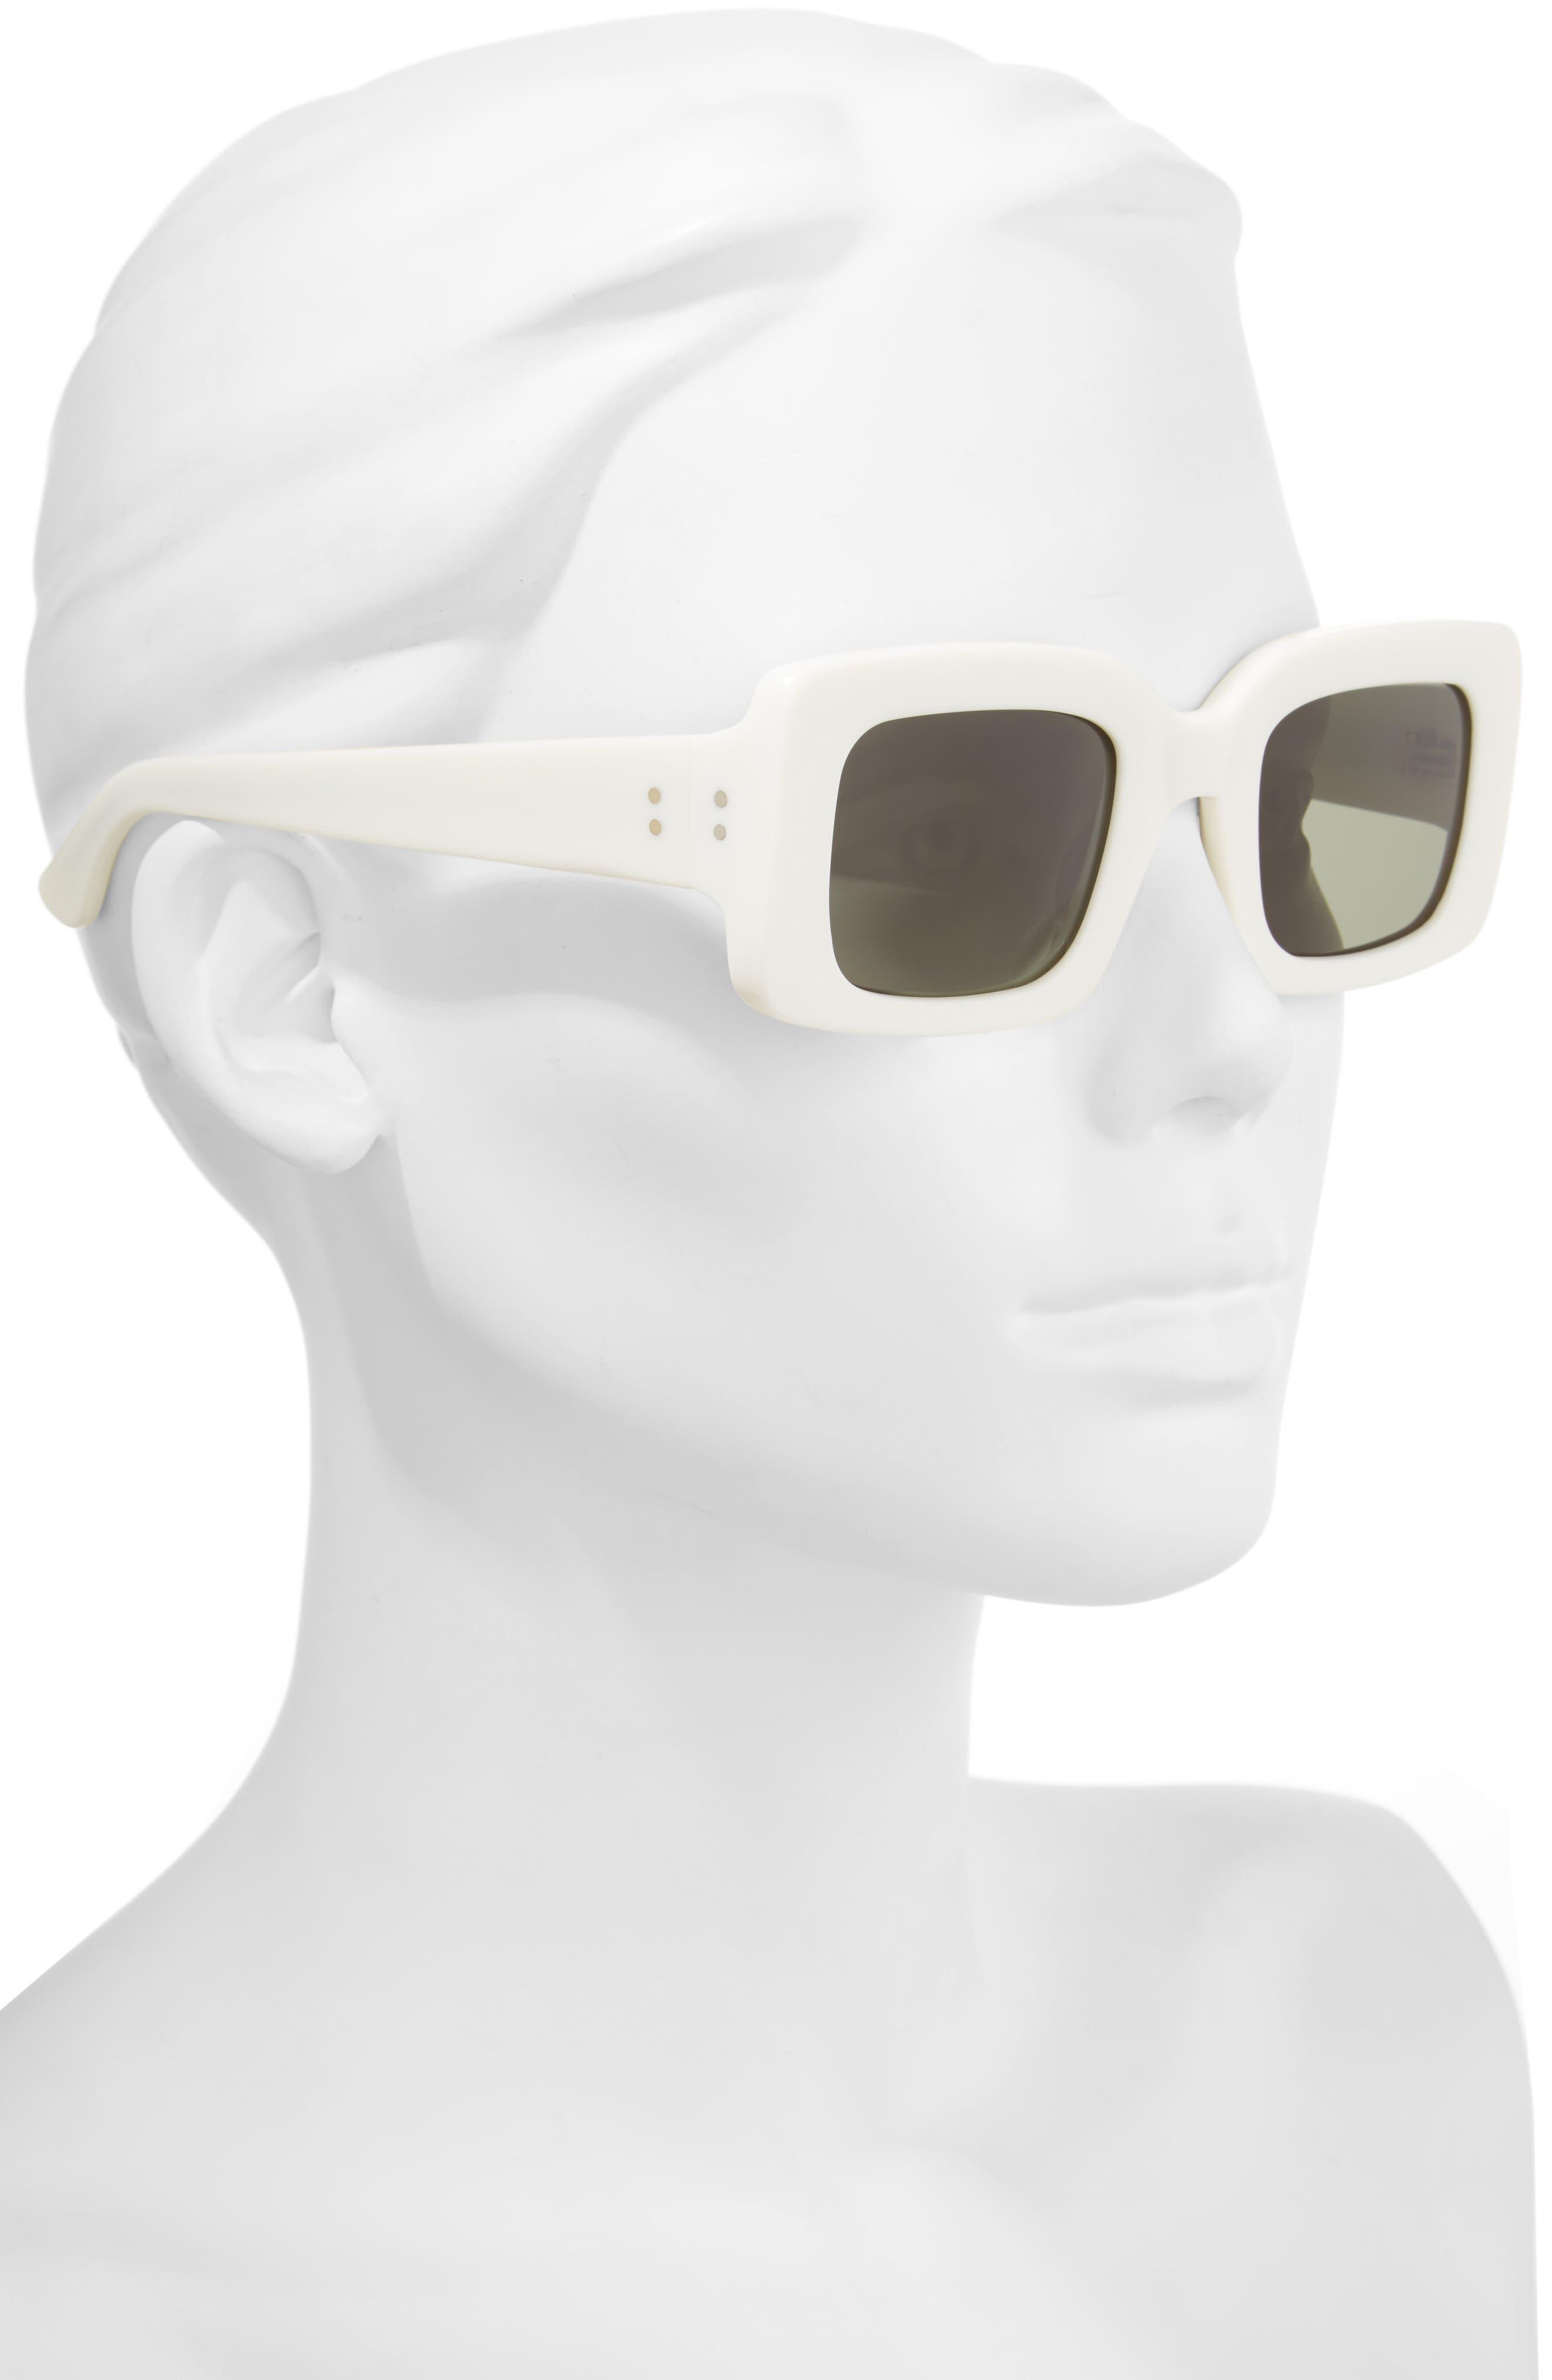 Alternate Image 2  - RAEN x Alex Knost Luxury Wig Flatscreen 49mm Square Sunglasses